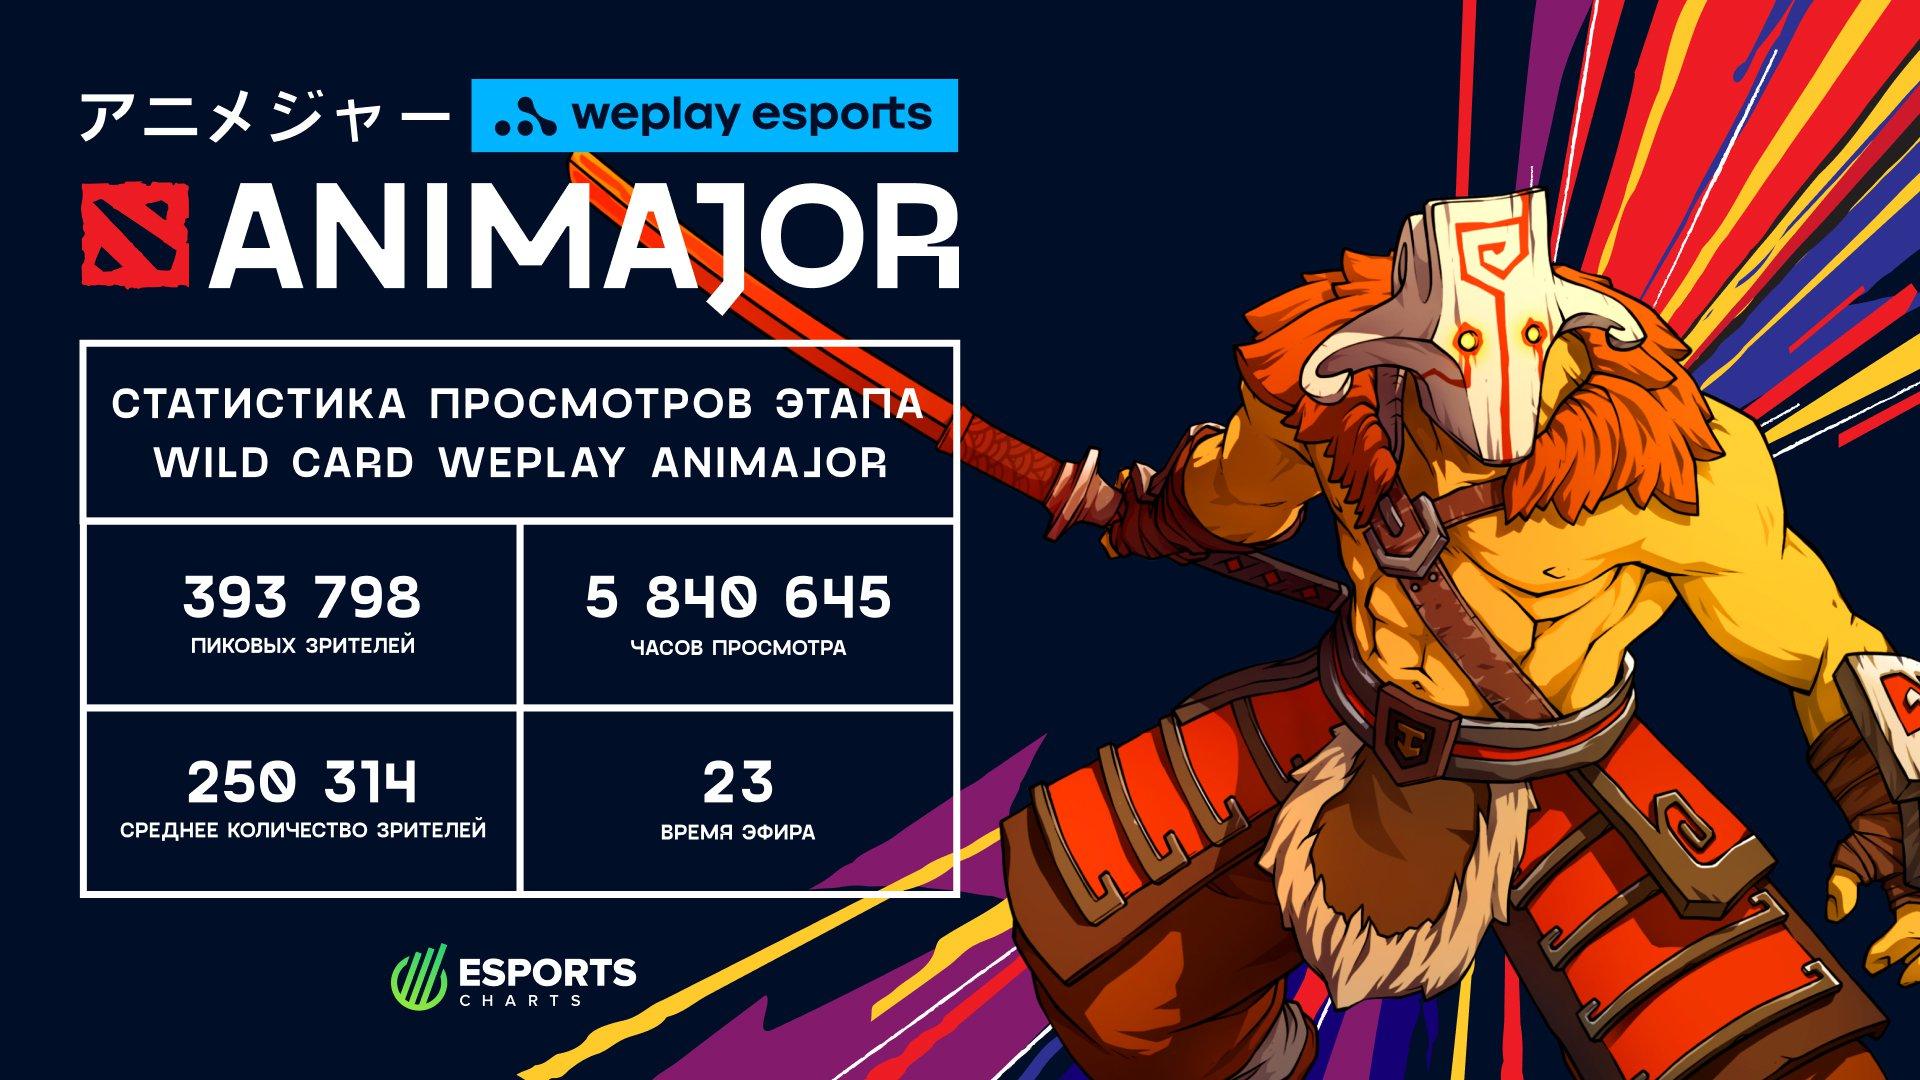 Статистика просмотров этапа Wild Card WePlay AniMajor. Изображение: WePlay Esports